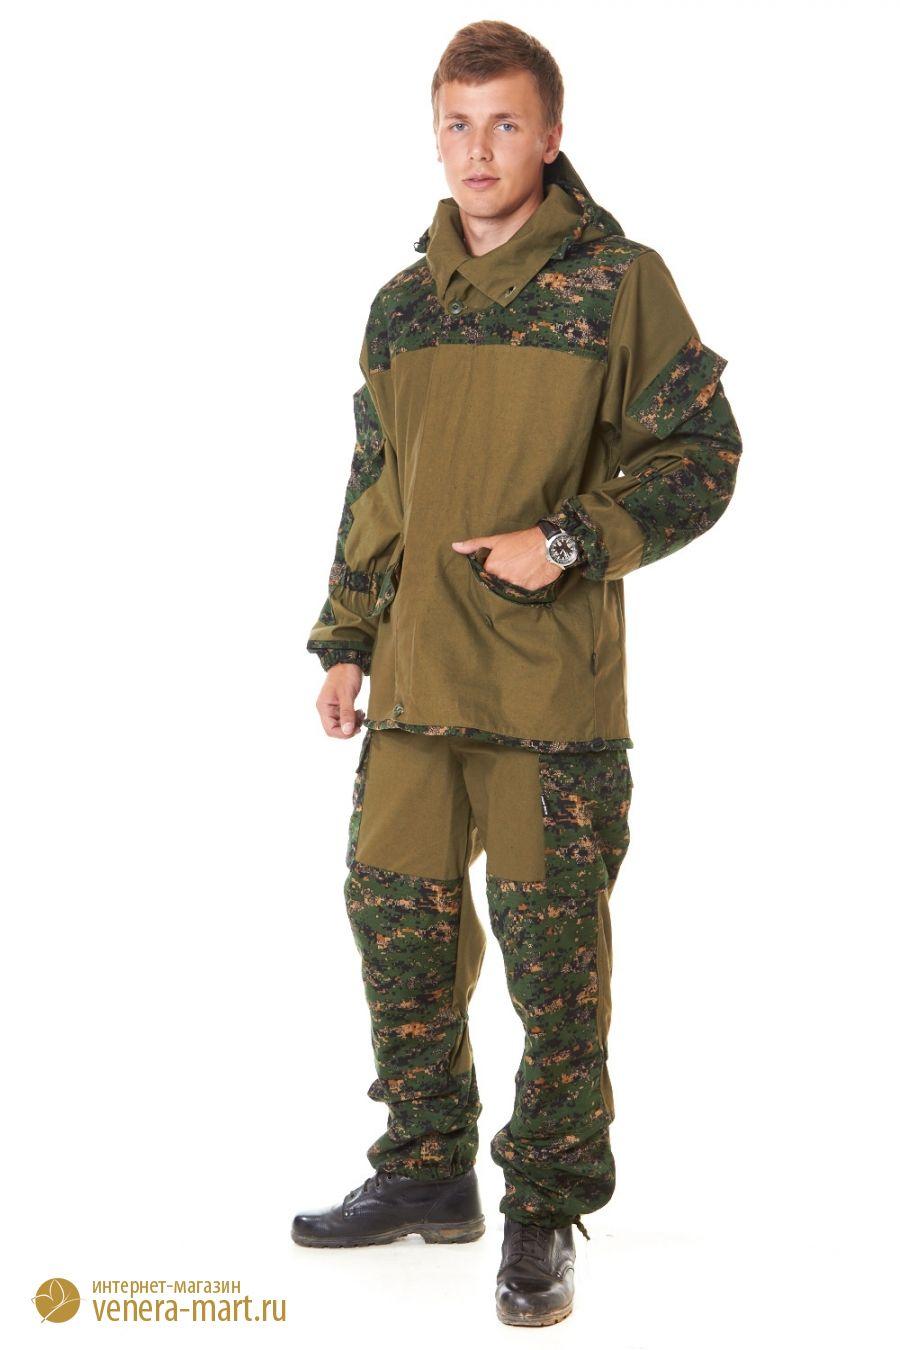 Костюм для охоты и рыбалки Горка-2Одежда для охоты и рыбалки<br><br><br>Размер: Камуфляж kl